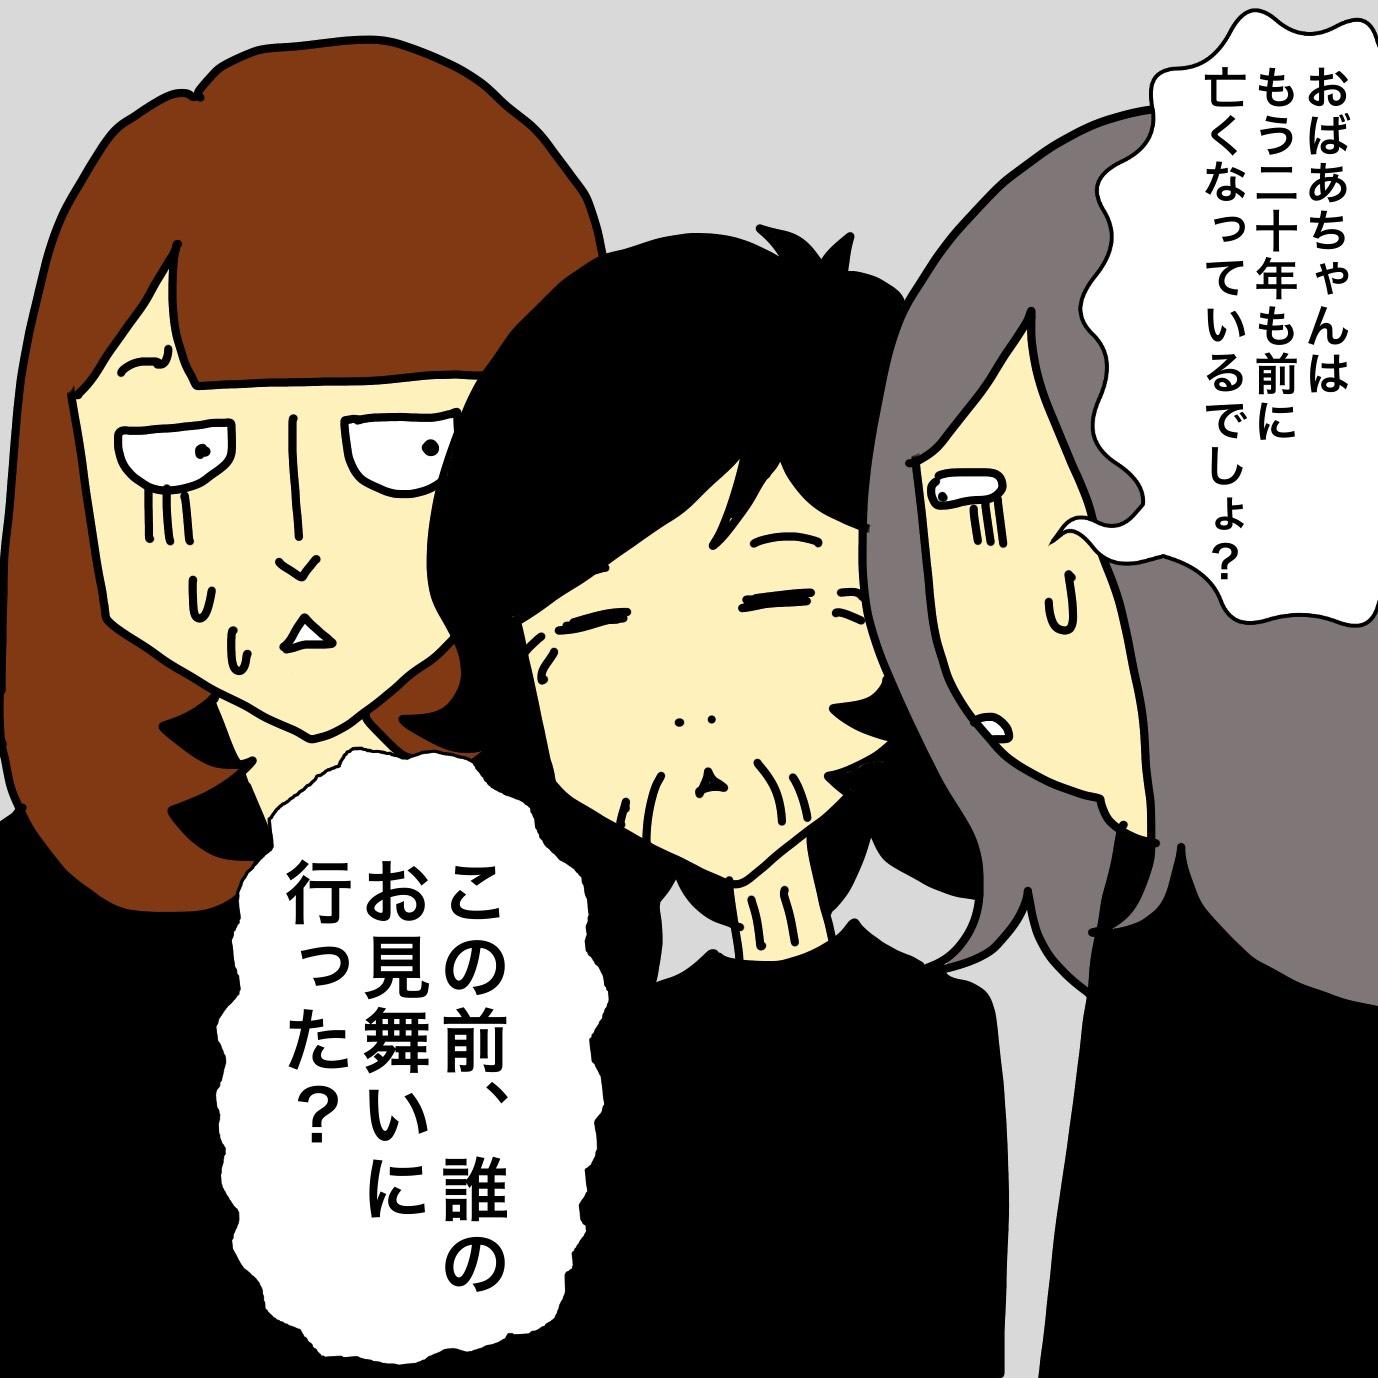 Image-8.jpeg